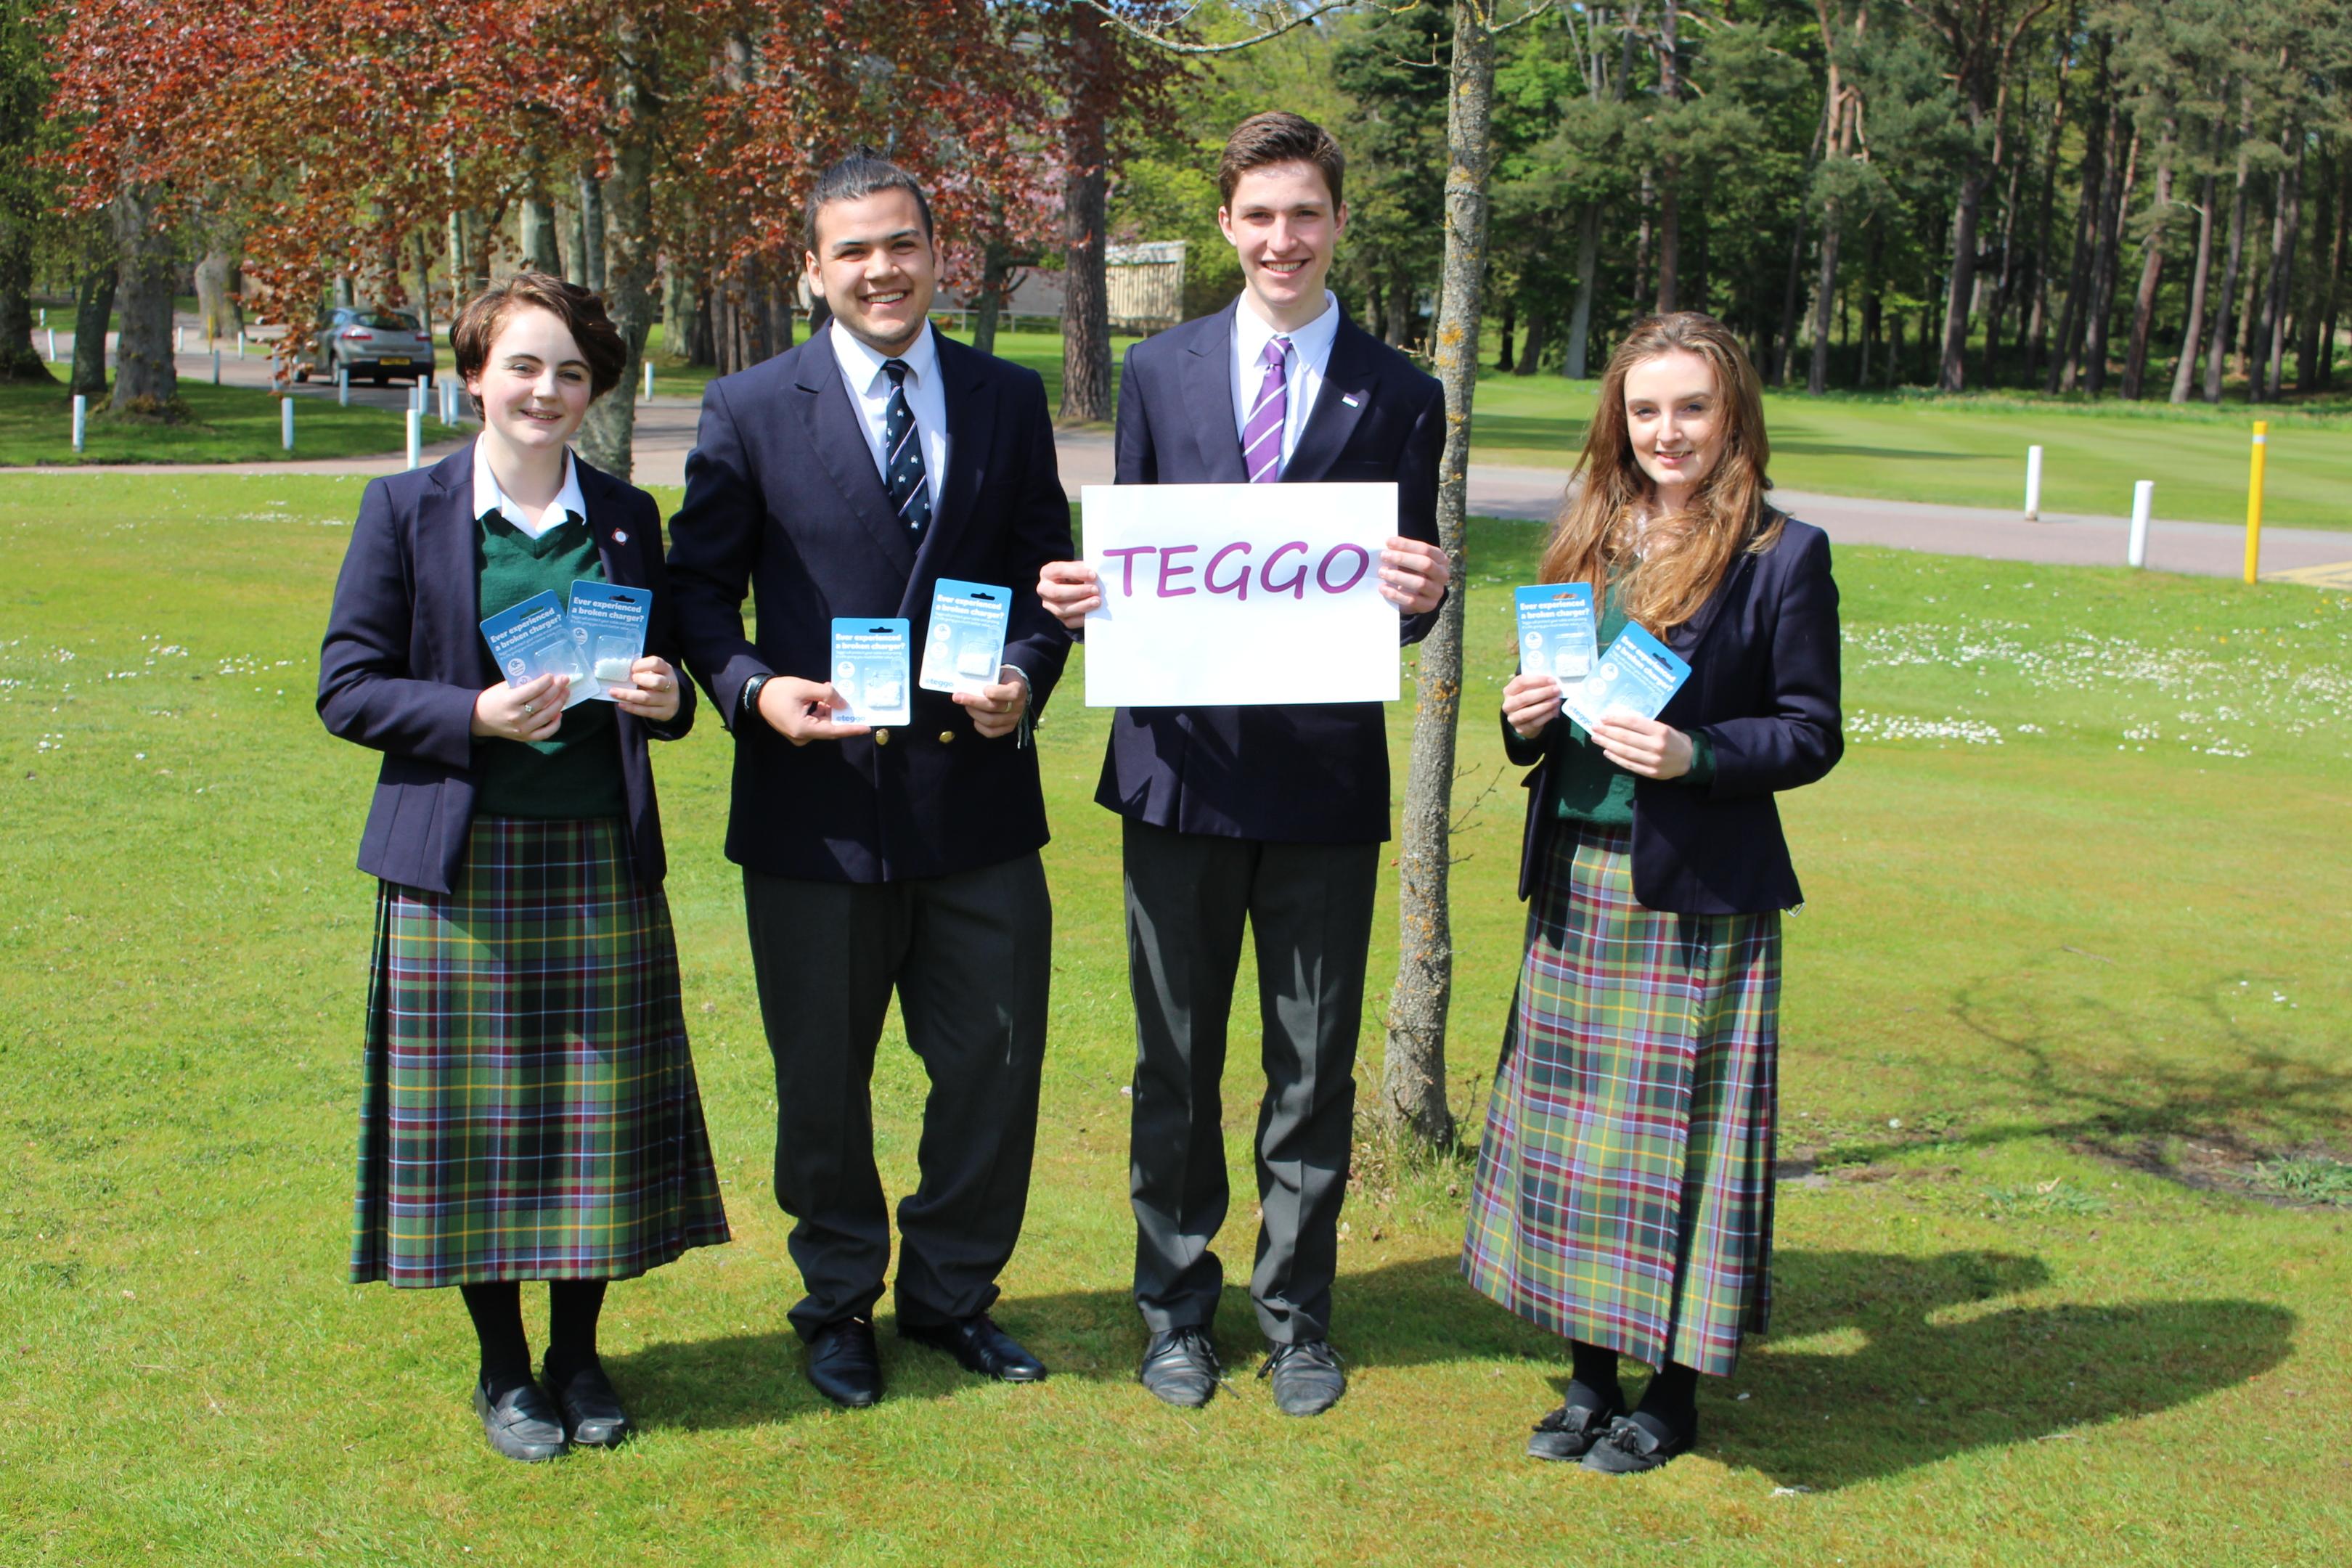 The Gordonstoun team behing Teggo: Imogen Mornement, Kane Edwards, Hugh Cunningham, Grace Pritchard.